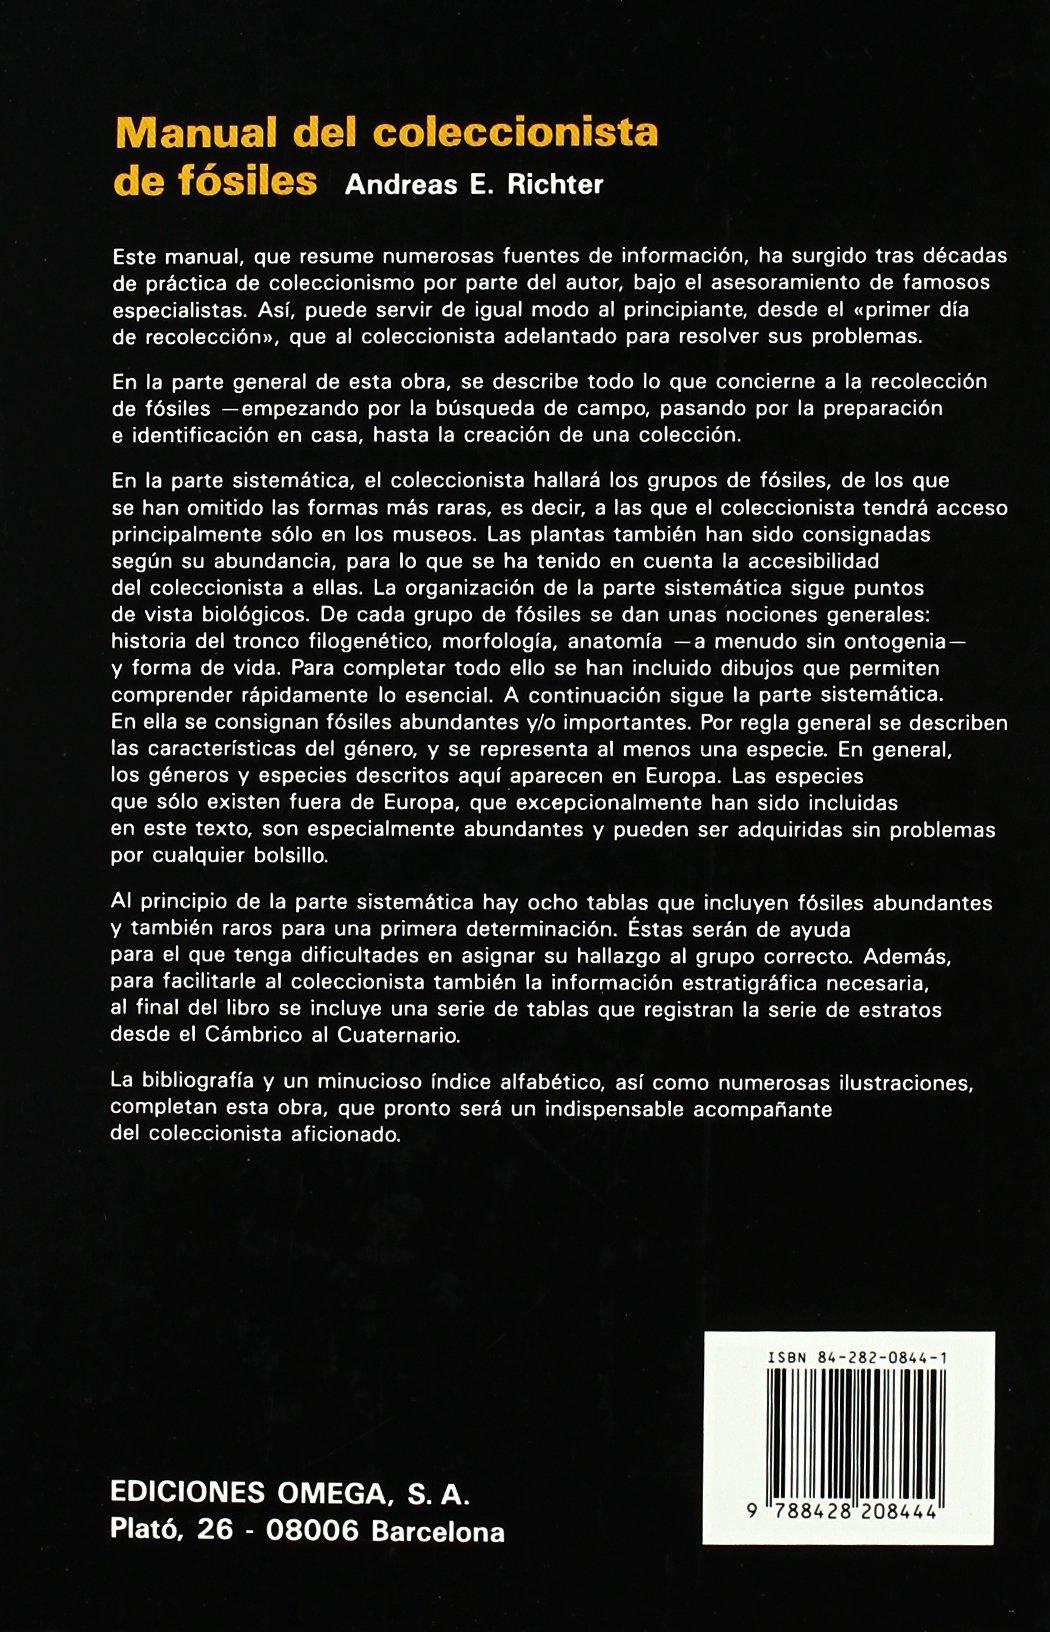 MANUAL DEL COLECCIONISTA DE FOSILES GUIAS DEL NATURALISTA-FÓSILES: Amazon.es: RICHTER, ANDREAS E.: Libros